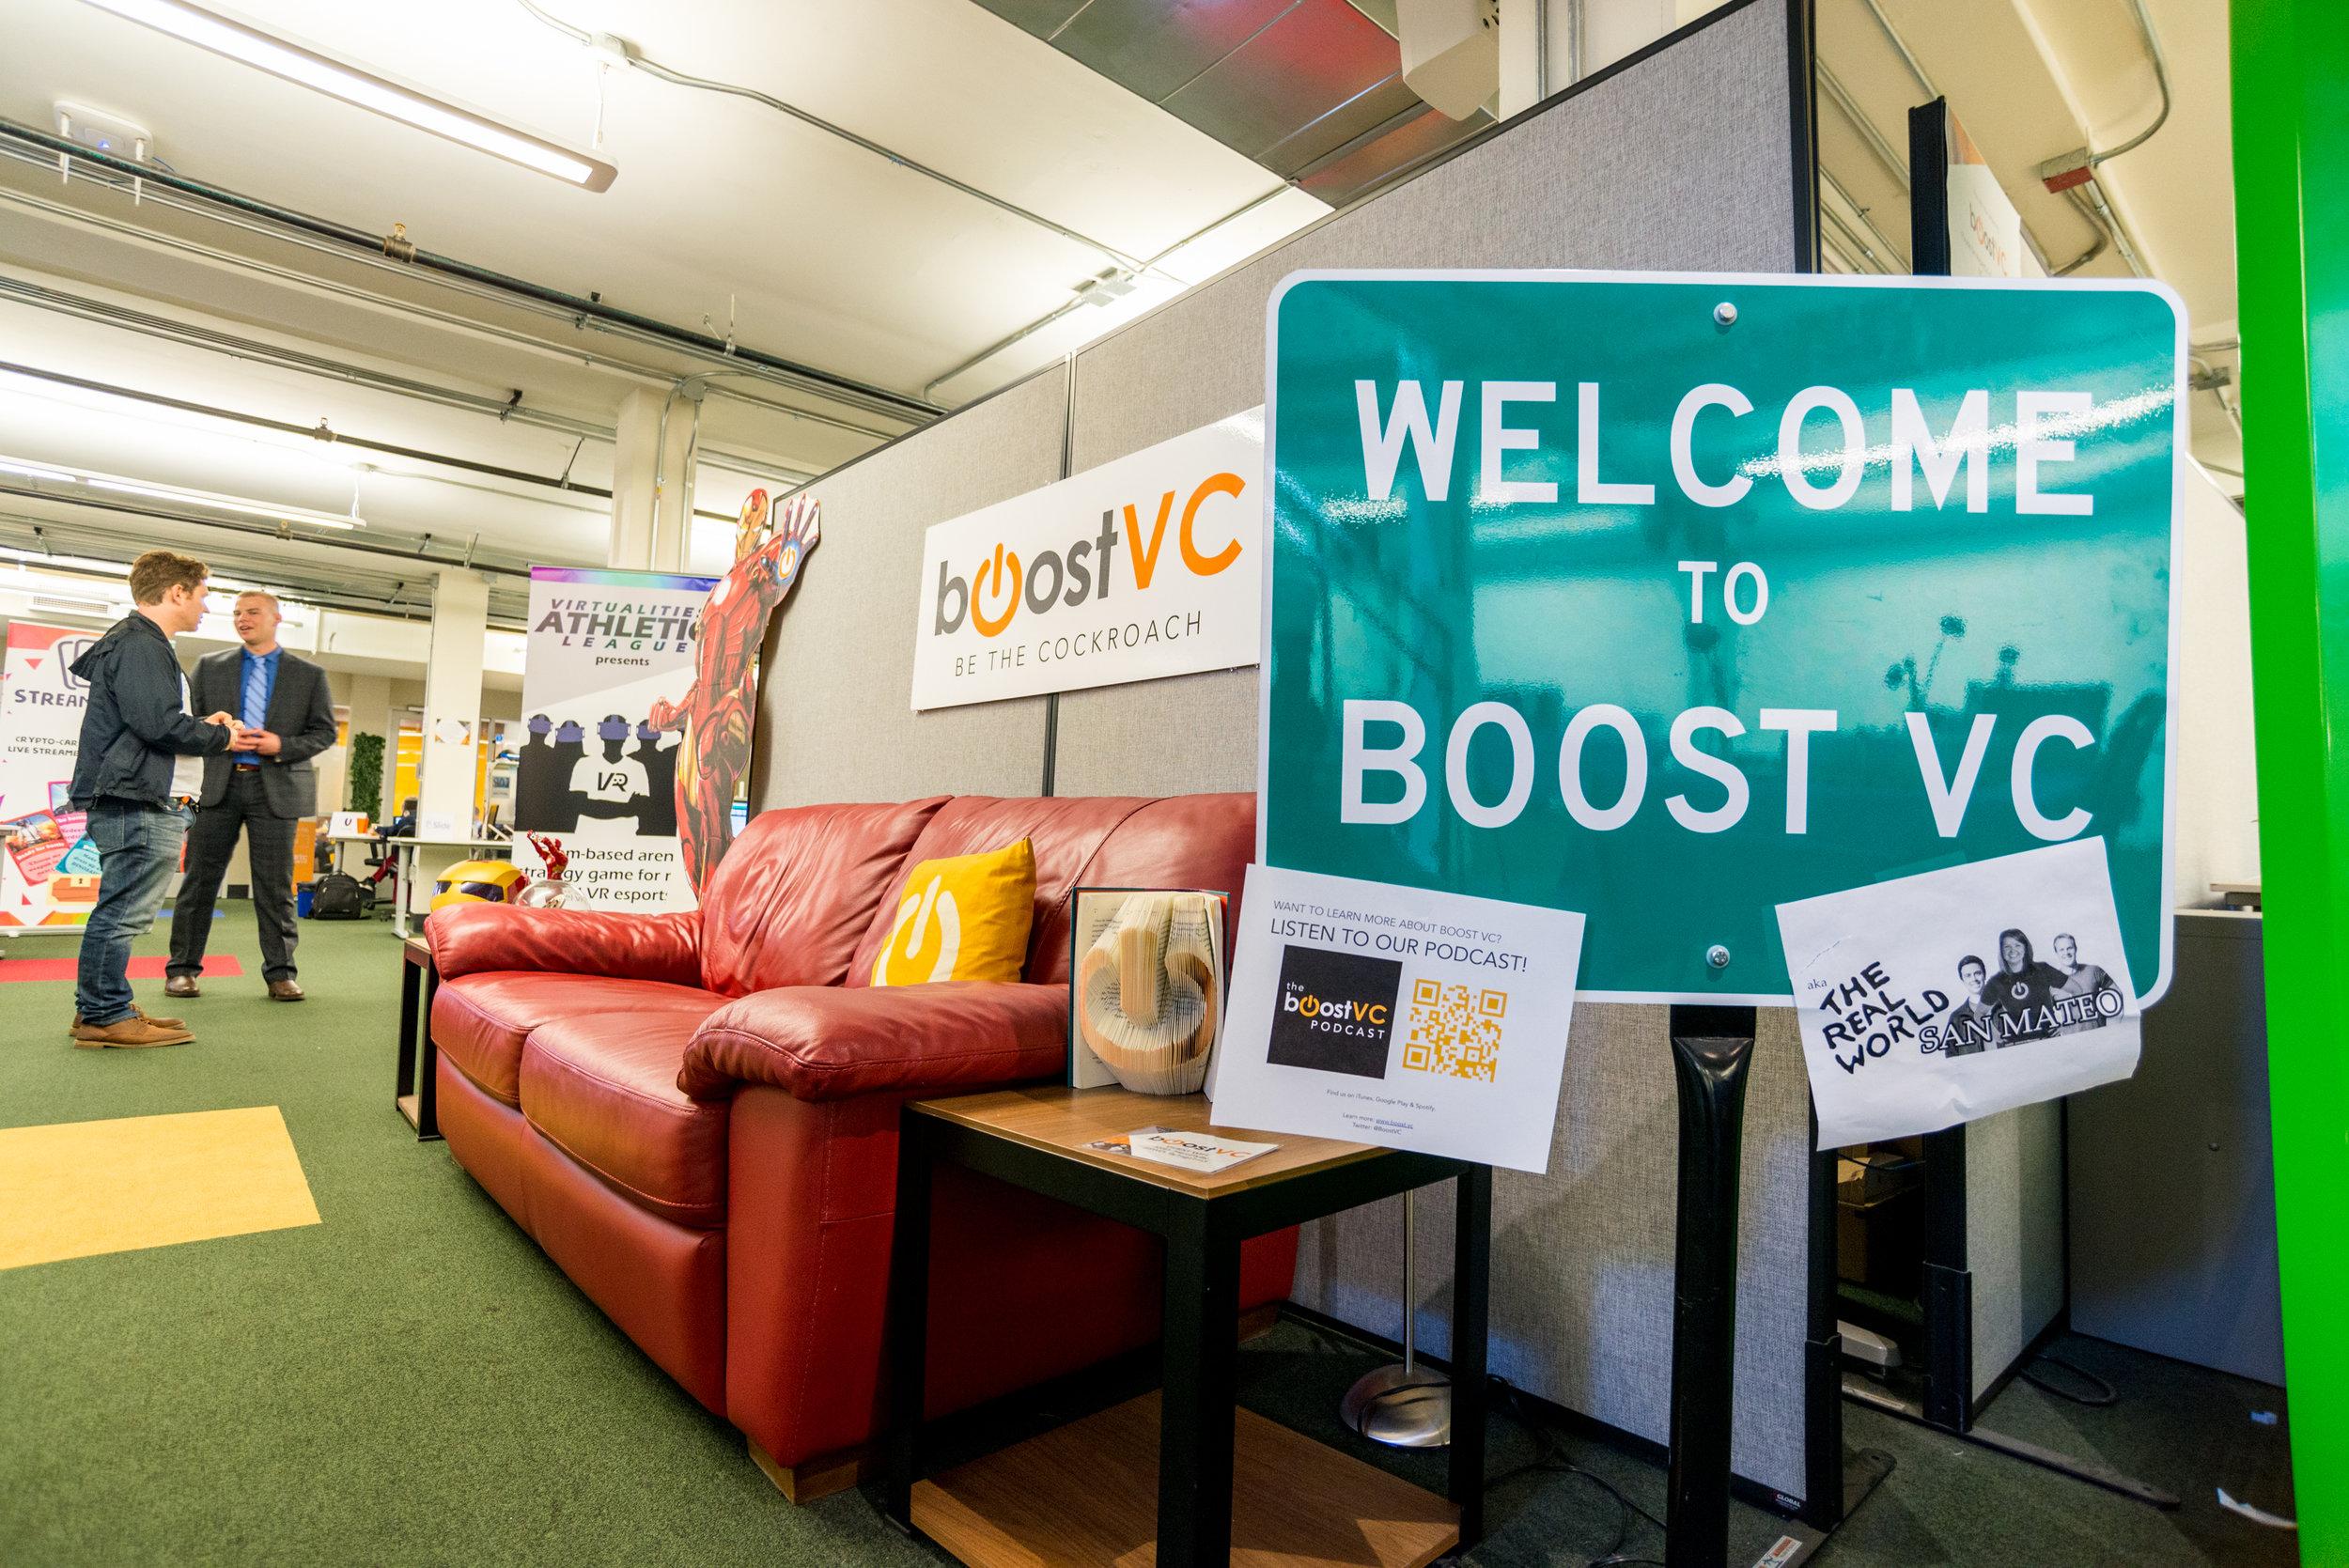 Boost VC accelerator. Photo by Alex Akamine.